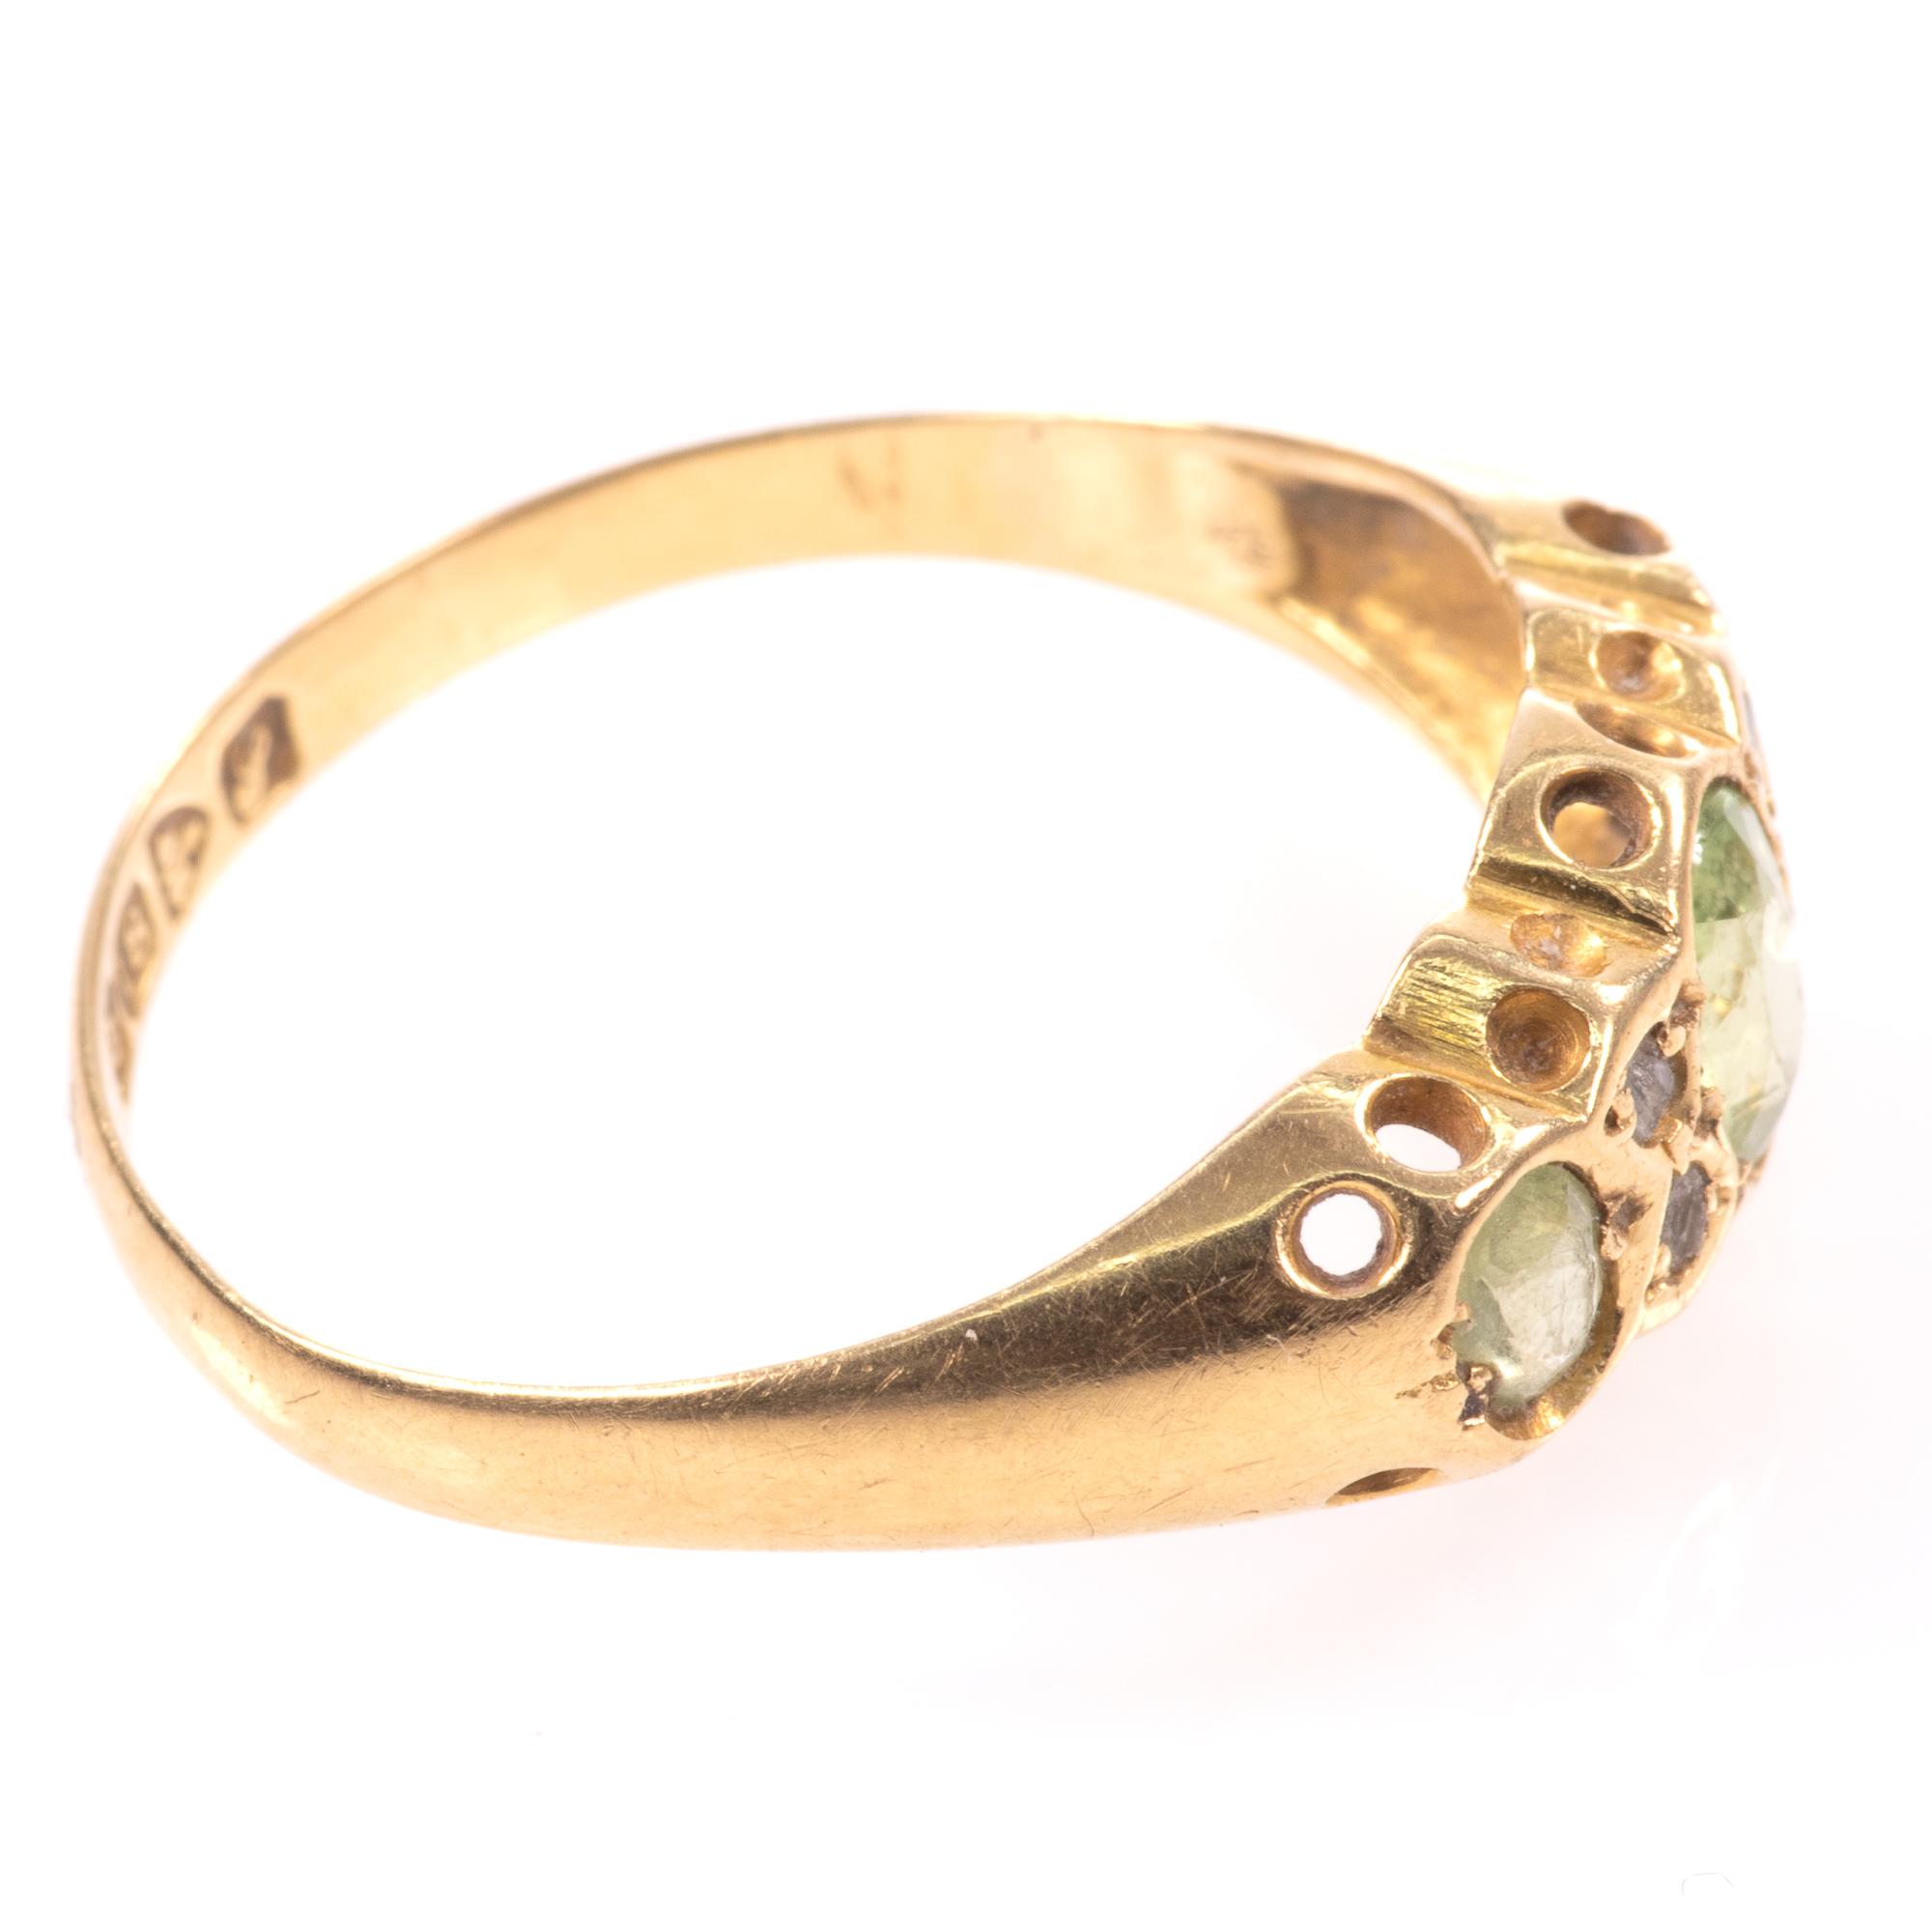 18ct Gold 0.90ct Peridot & Diamond Ring Chester 1918 - Image 8 of 8